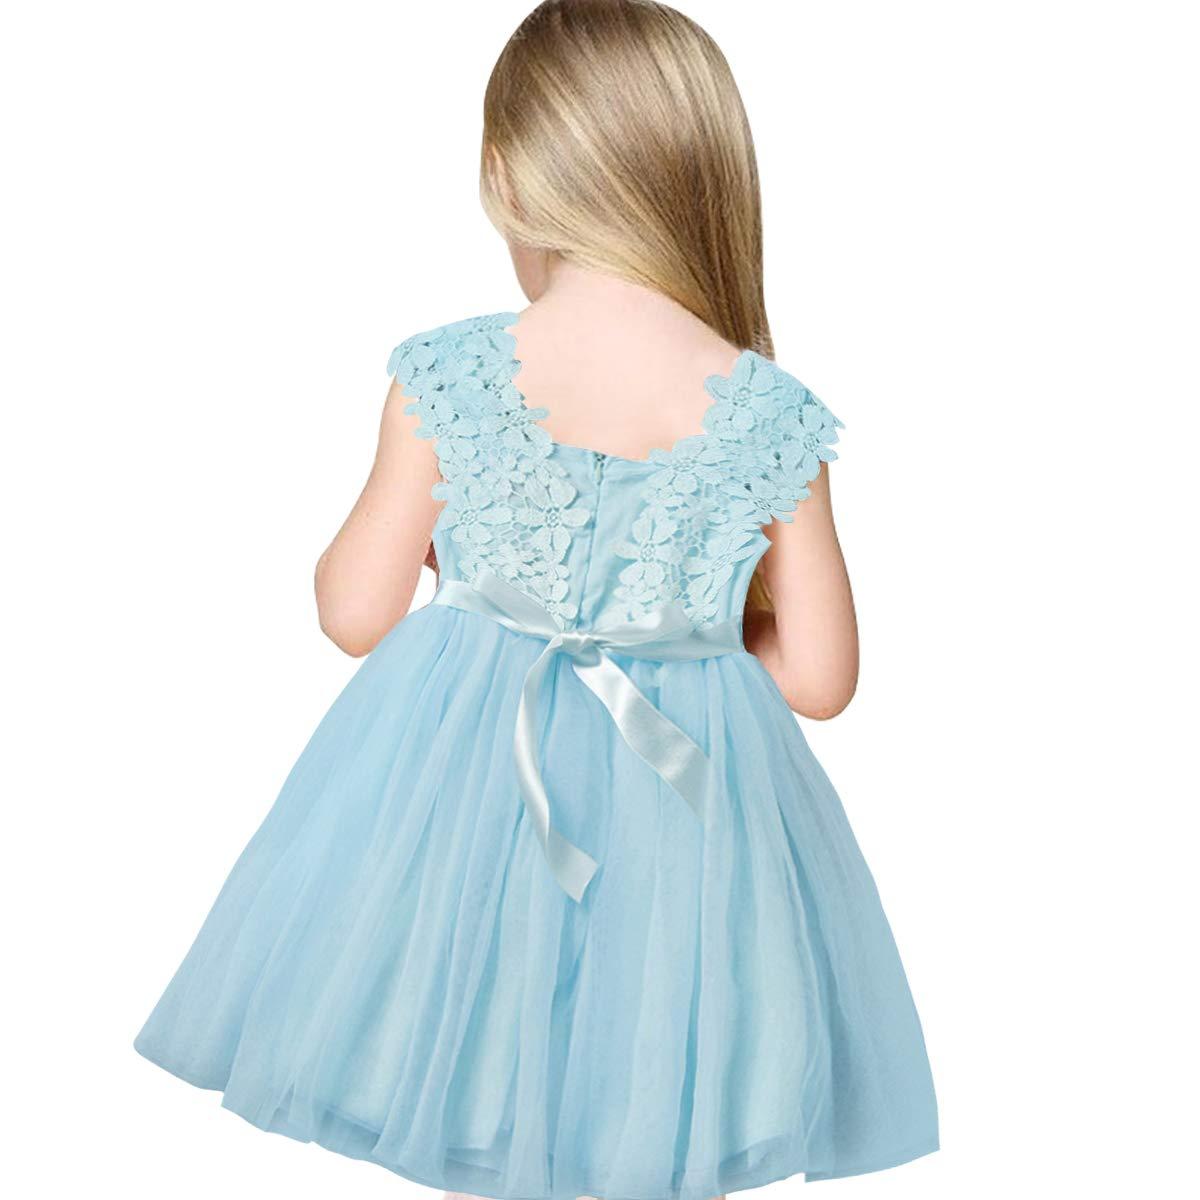 SOVIKER Baby Girls Princess Flower Dress Sleeveless Lace Tutu Gown Bridesmaid Party Wedding Birthday Dress